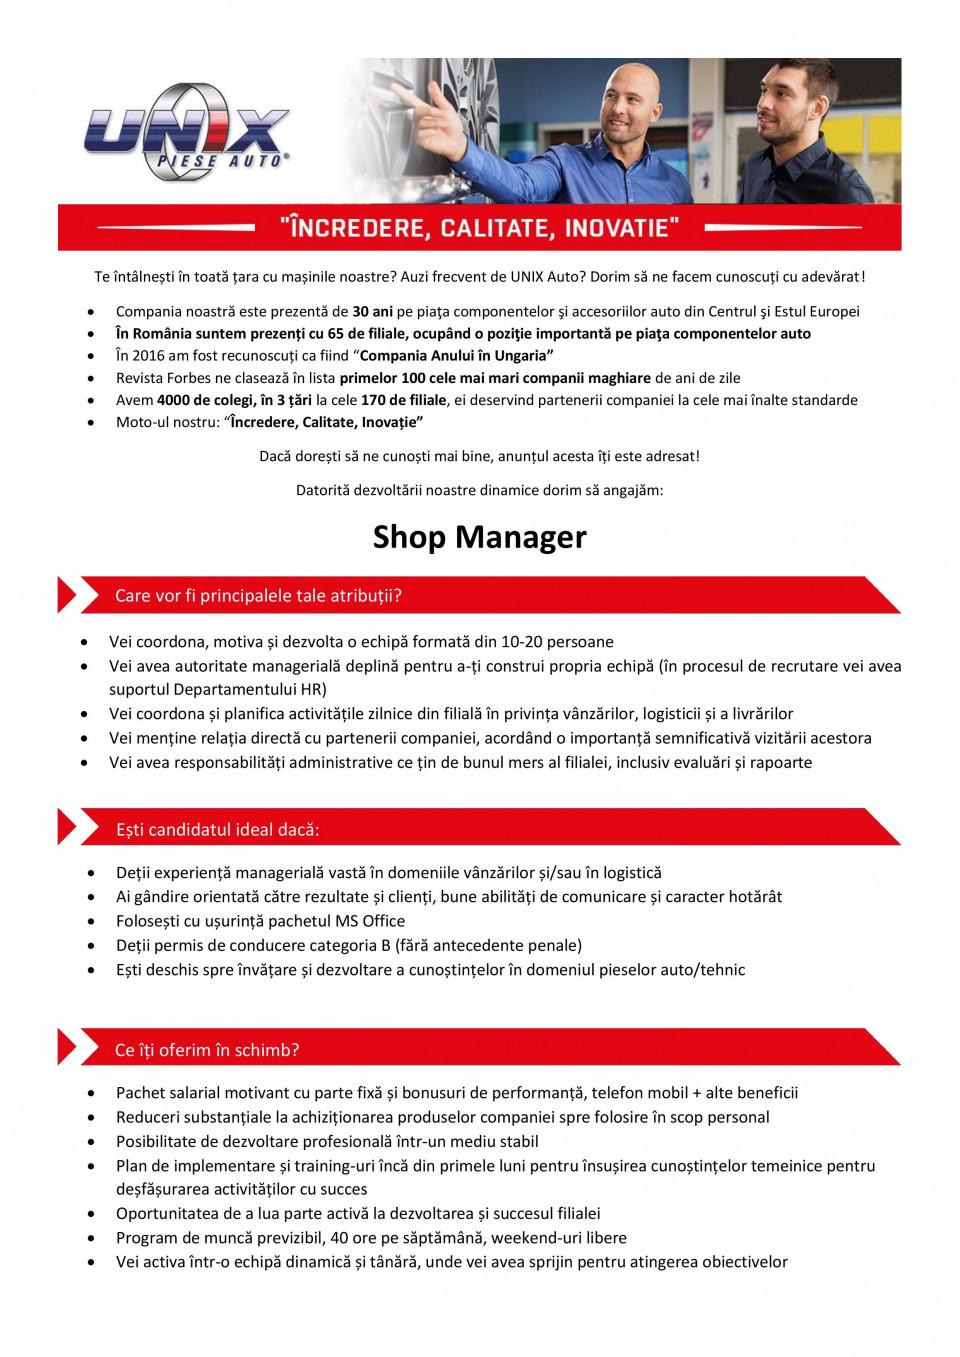 Shop Manager   INCREDERE, CALITATE, INOVATIE